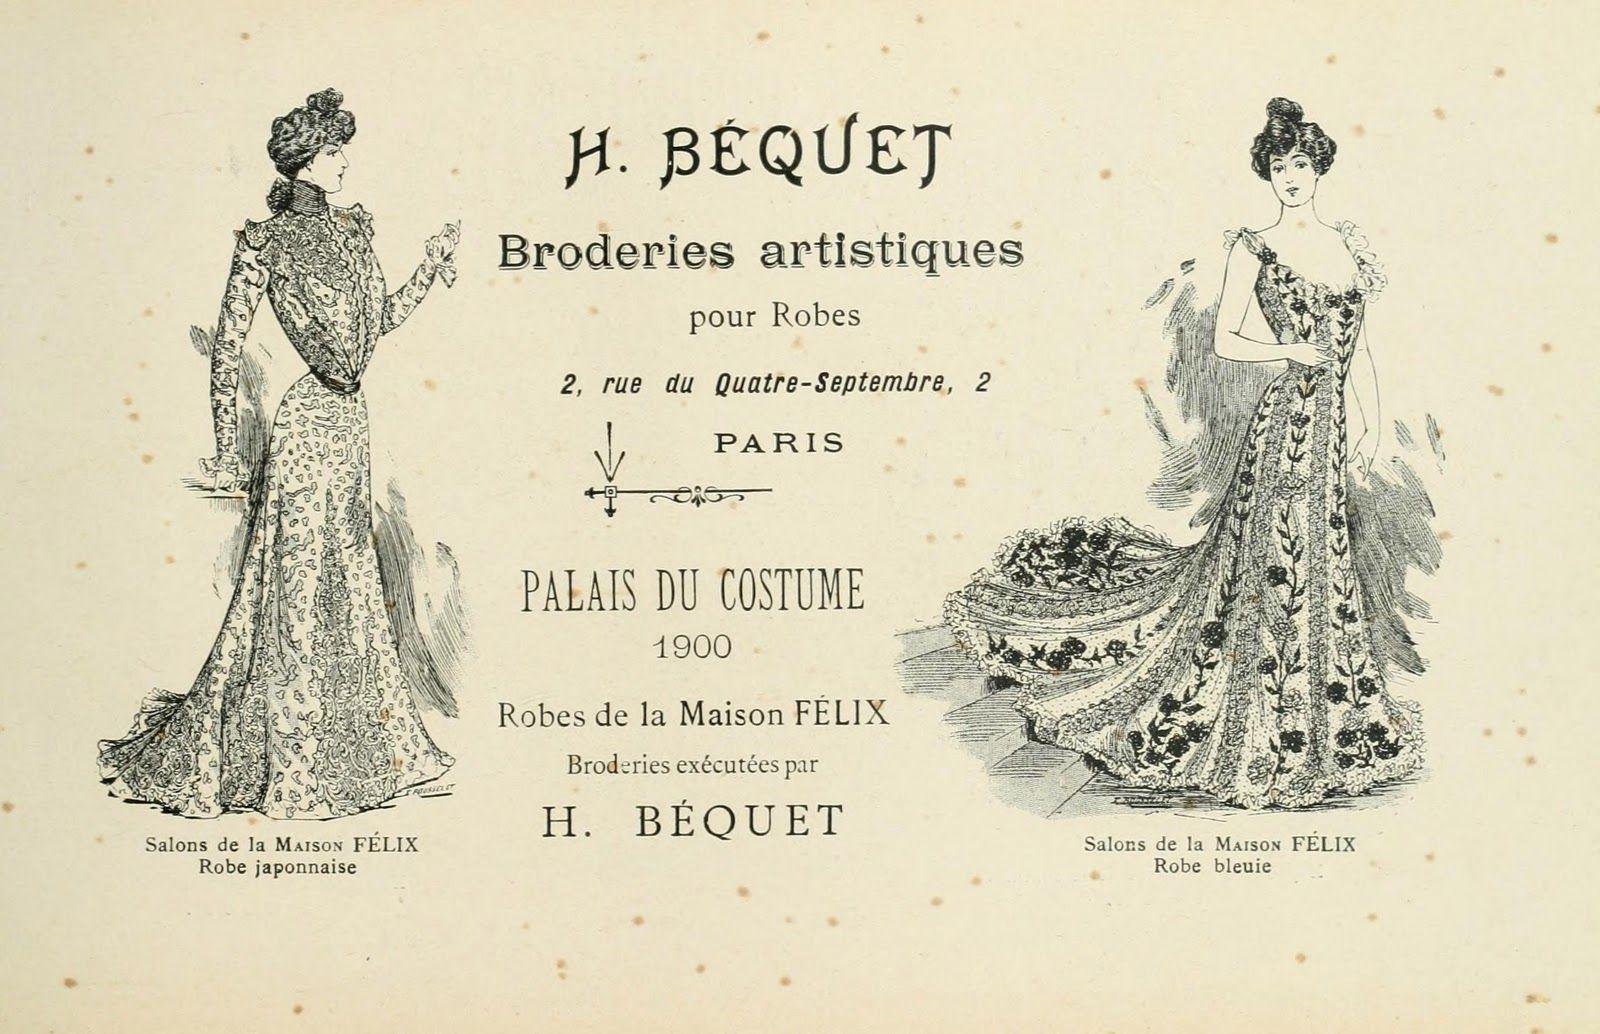 French Ephemera   Vintage Ephemera: French costume advertisement, 1900